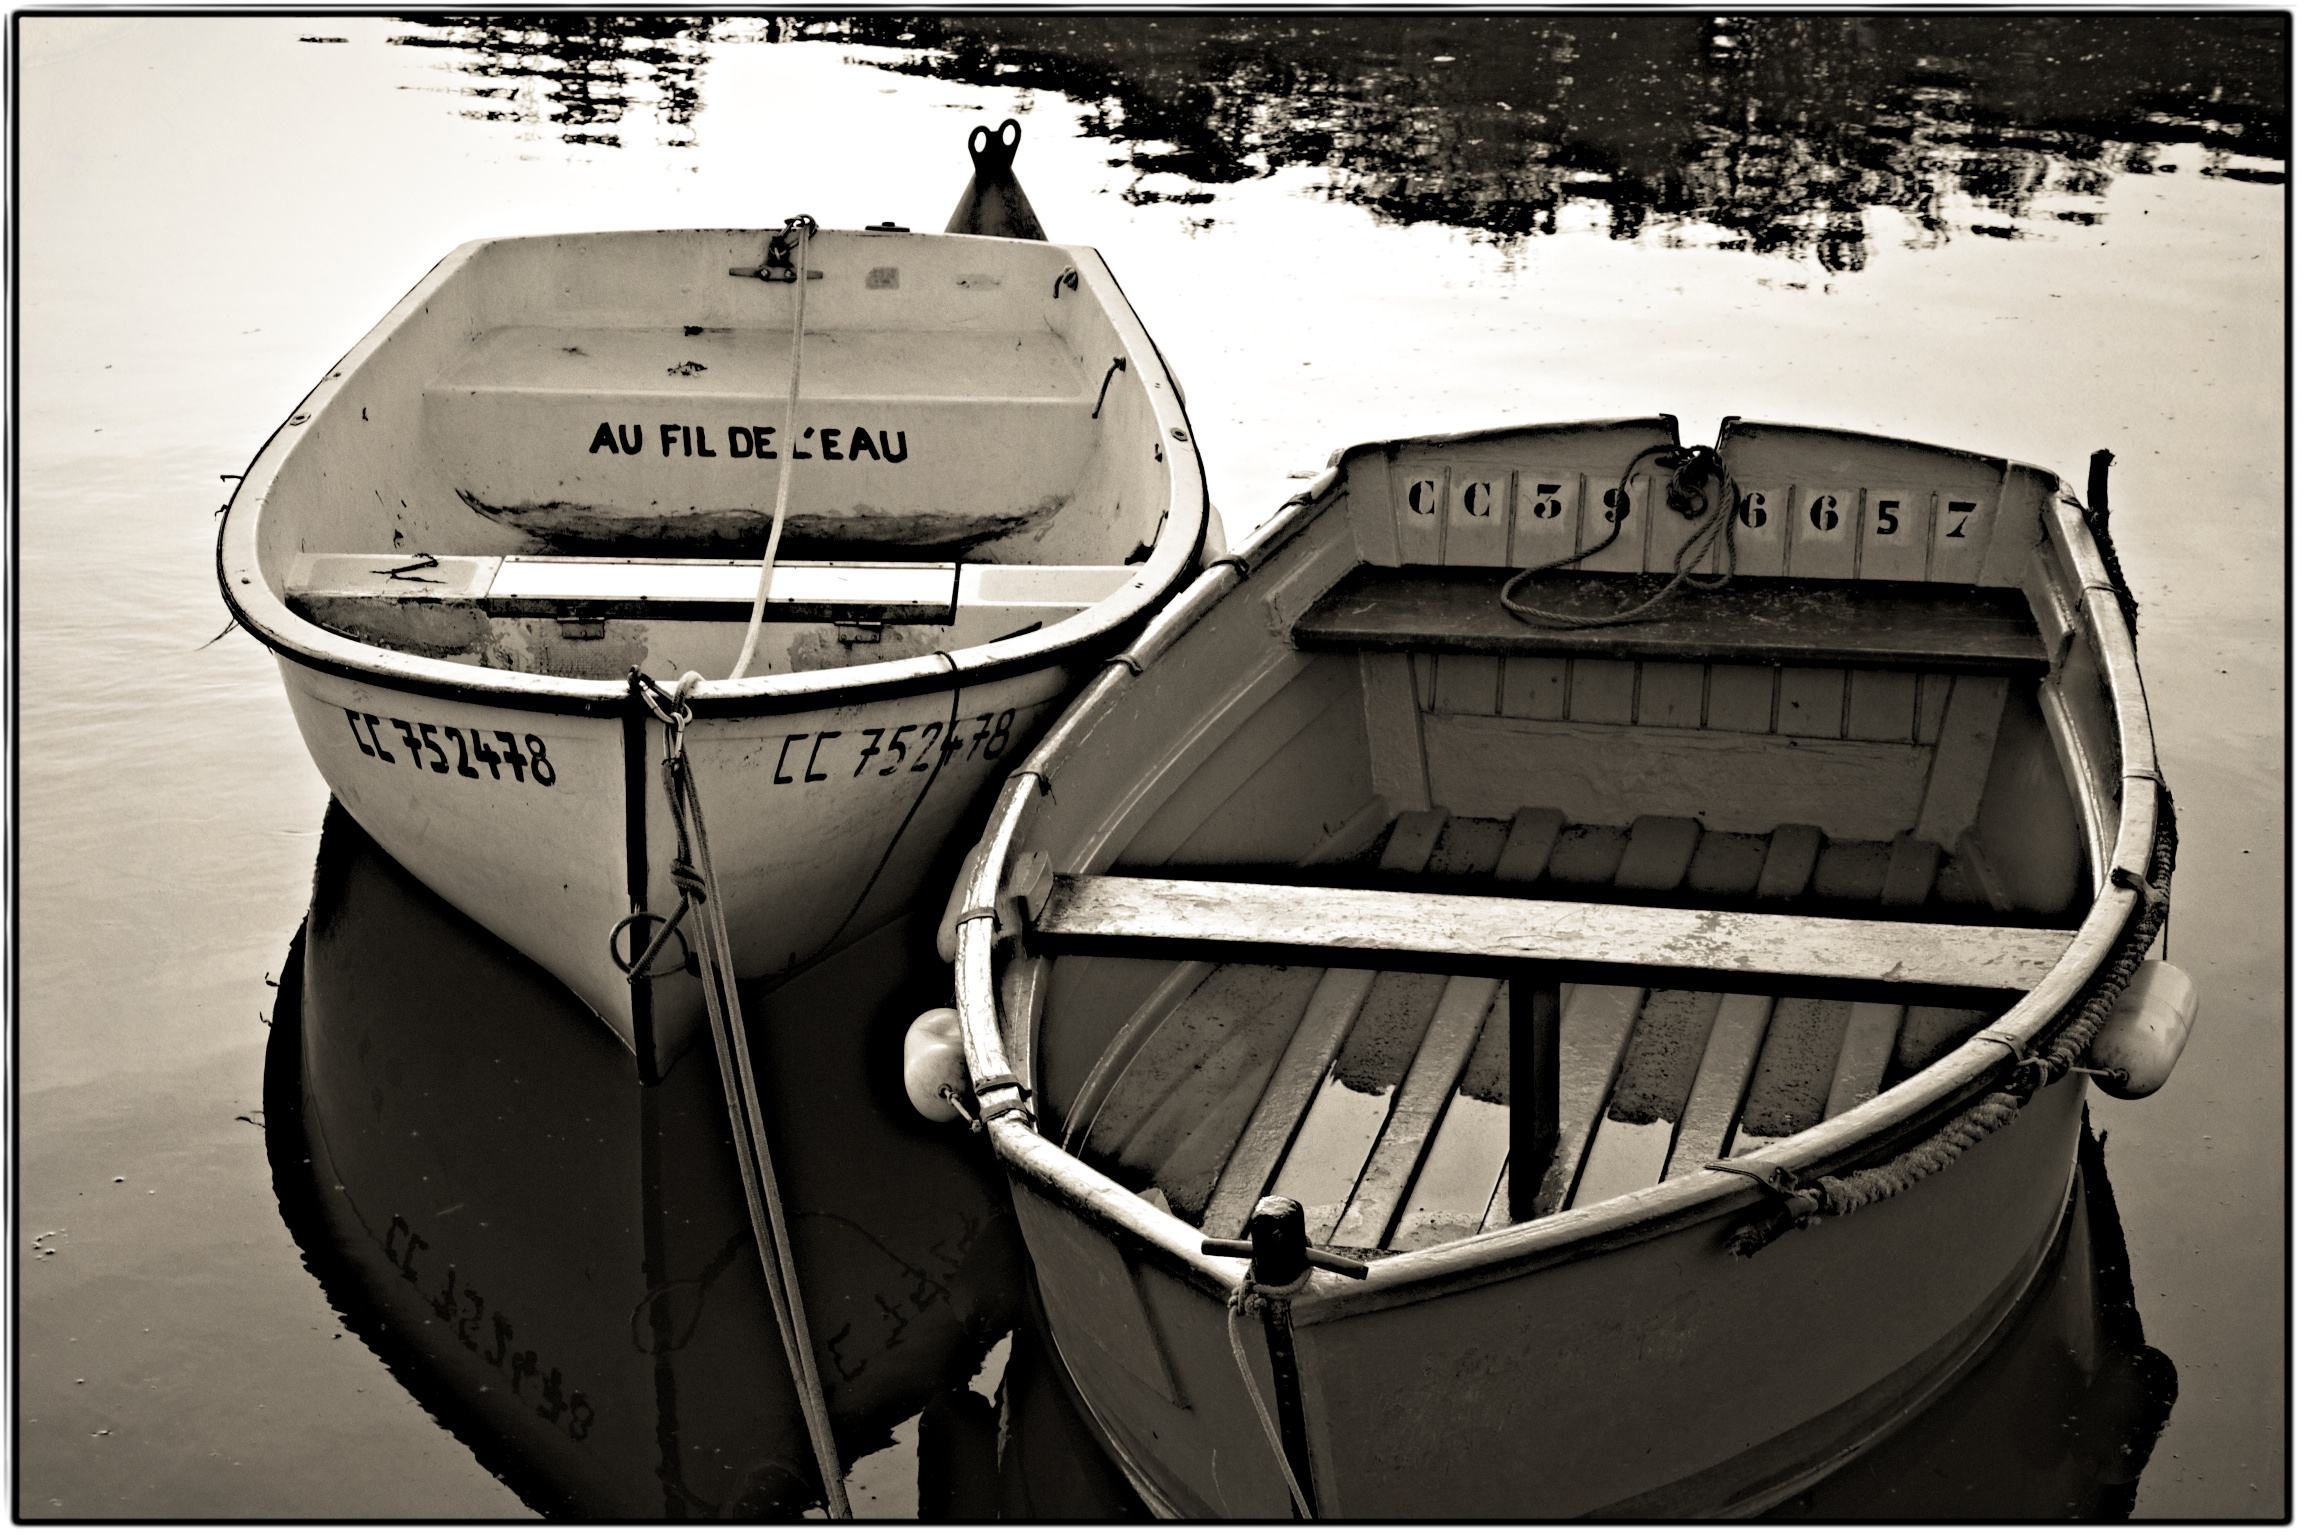 Barques au fil de l'eau custom.jpg